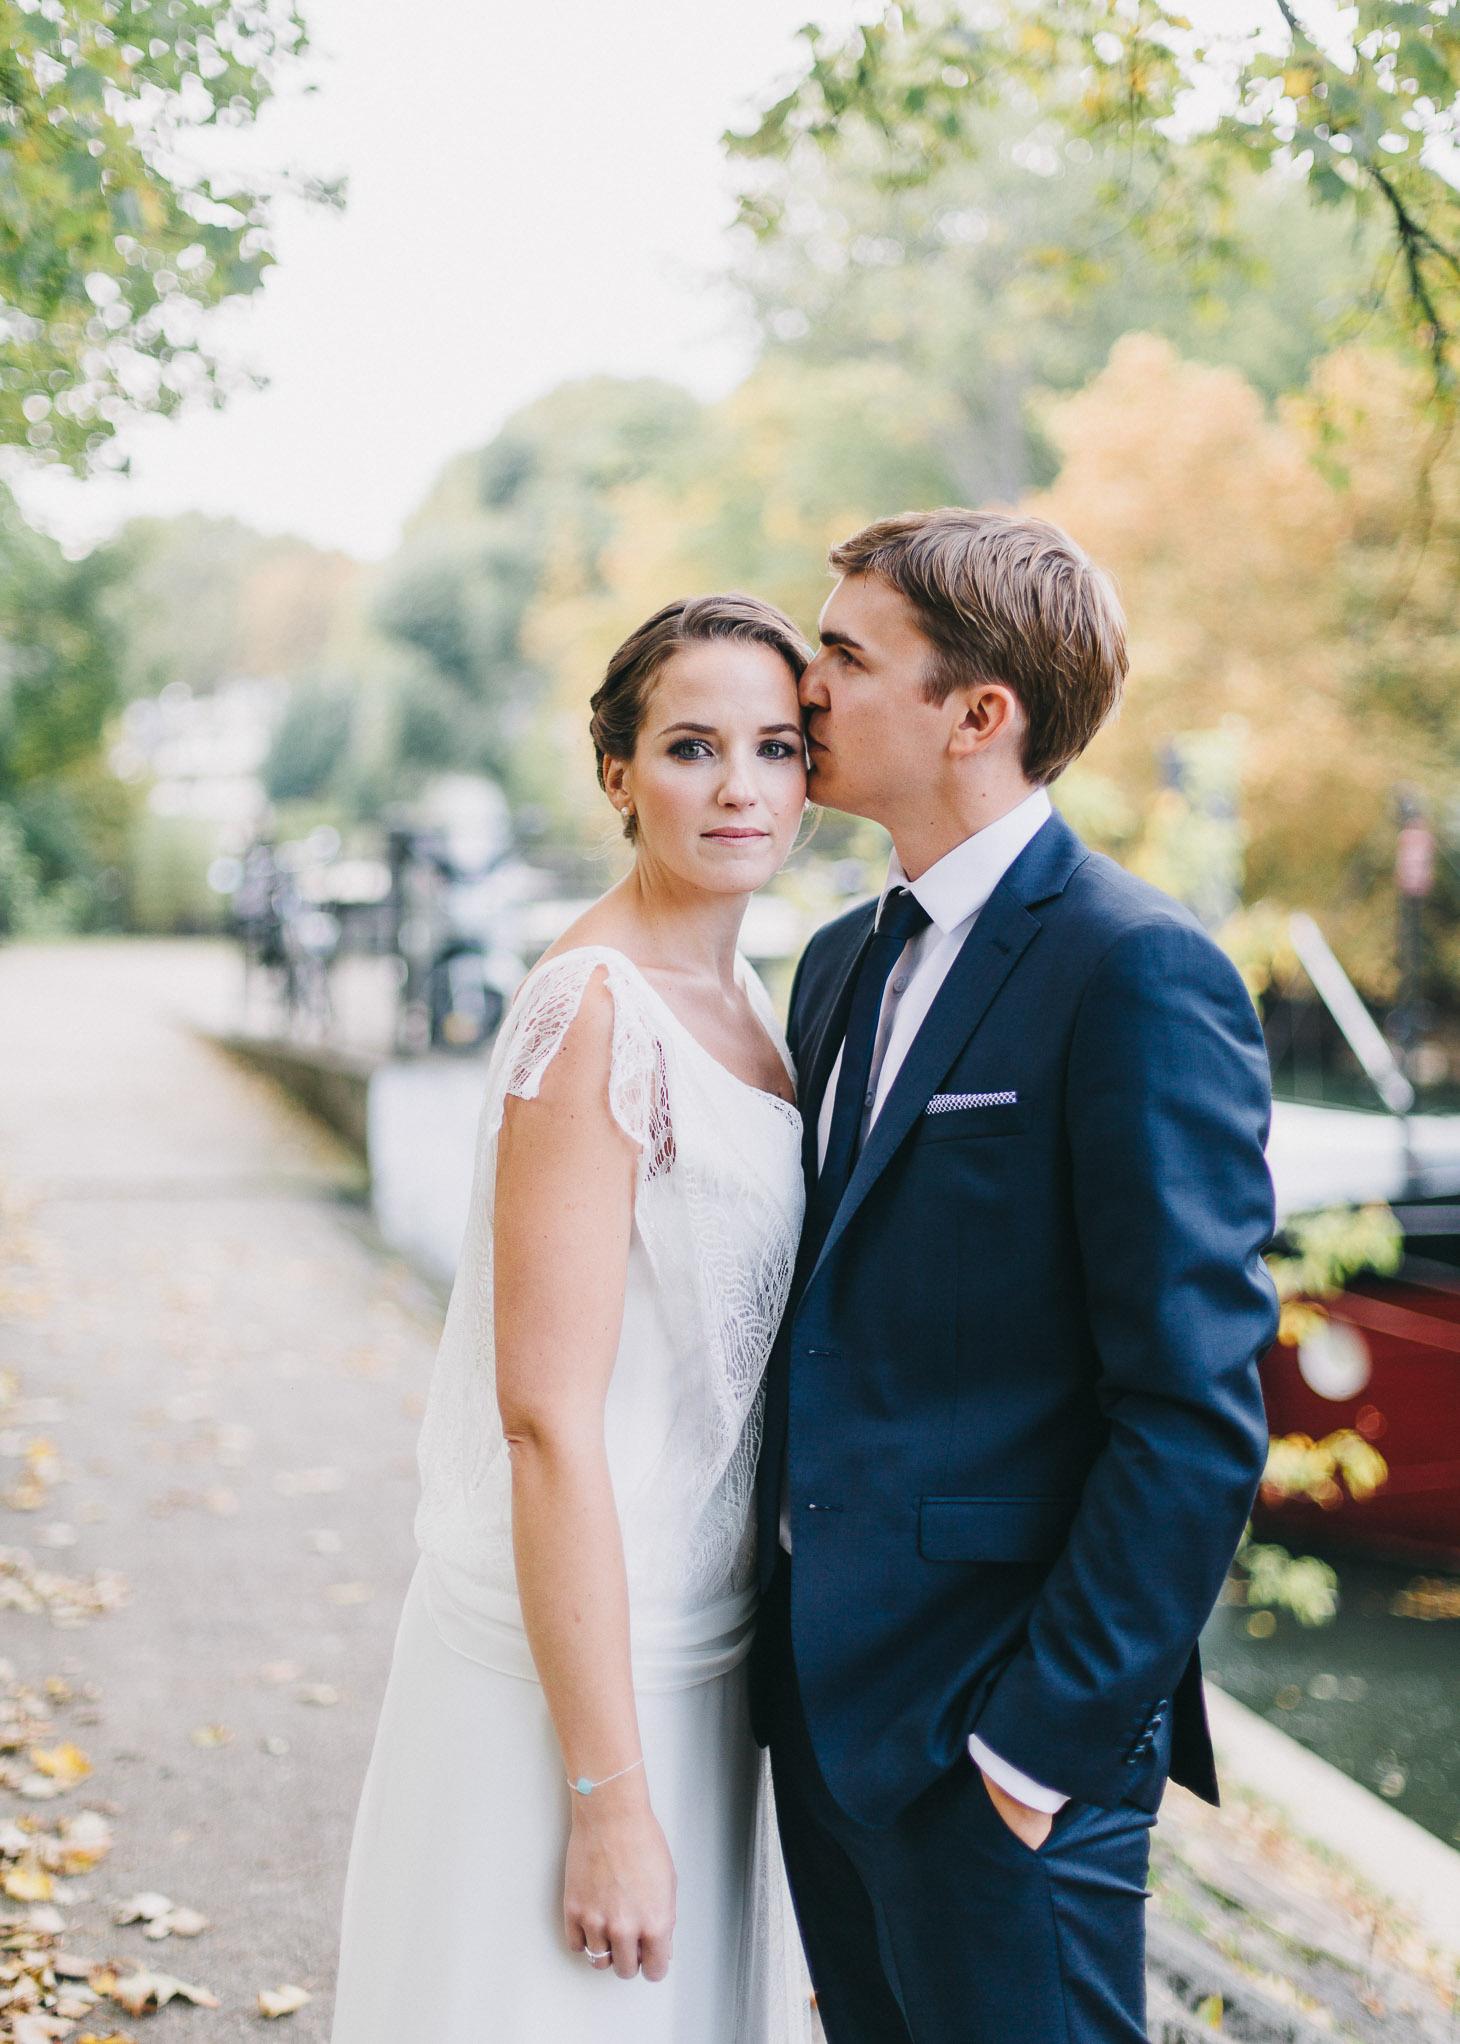 photographe_mariage_paris-04